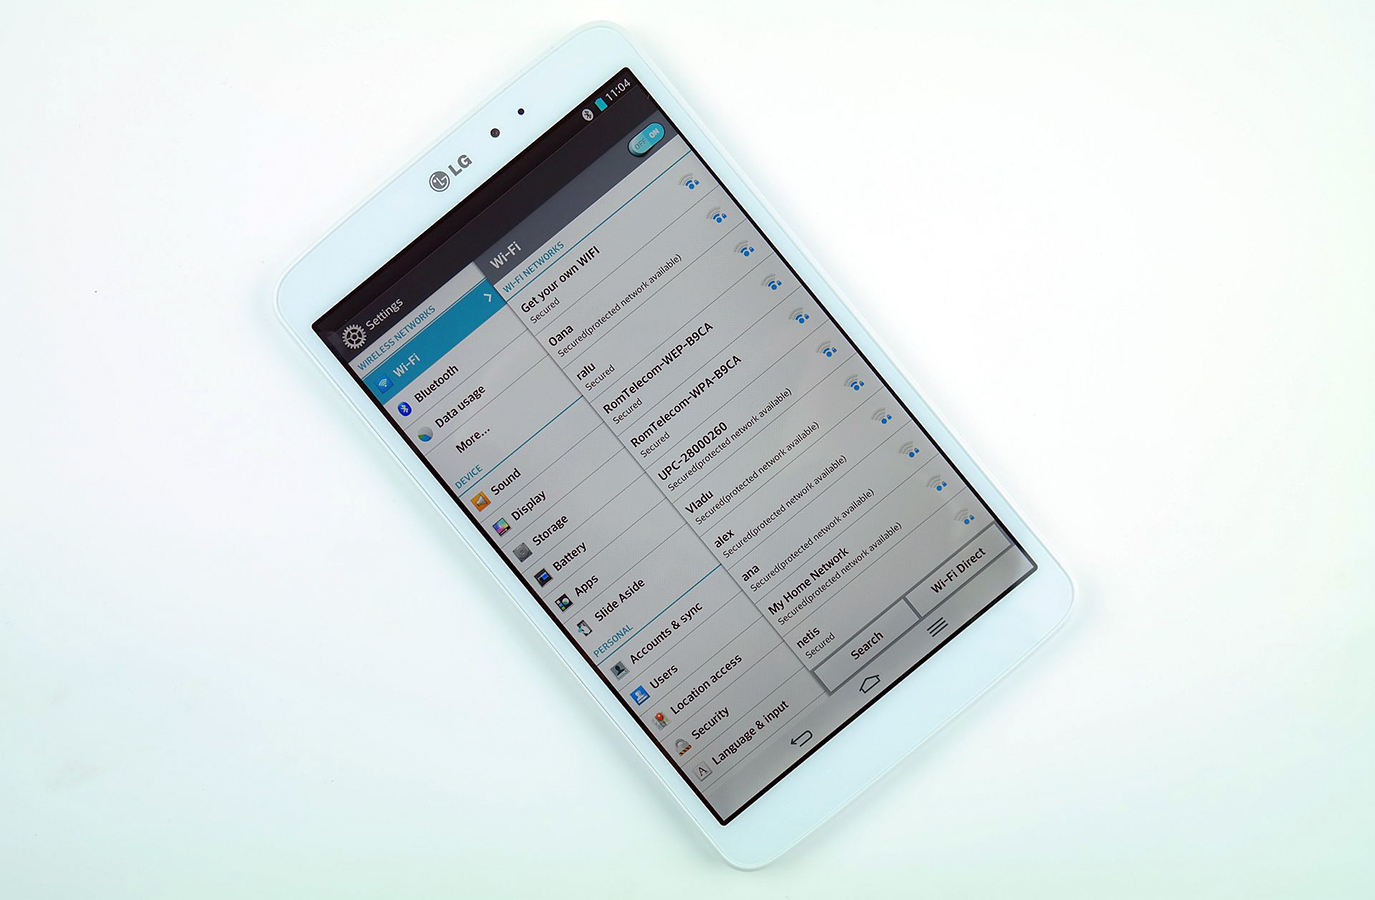 REVIEW LG GPad 8.3 setari software